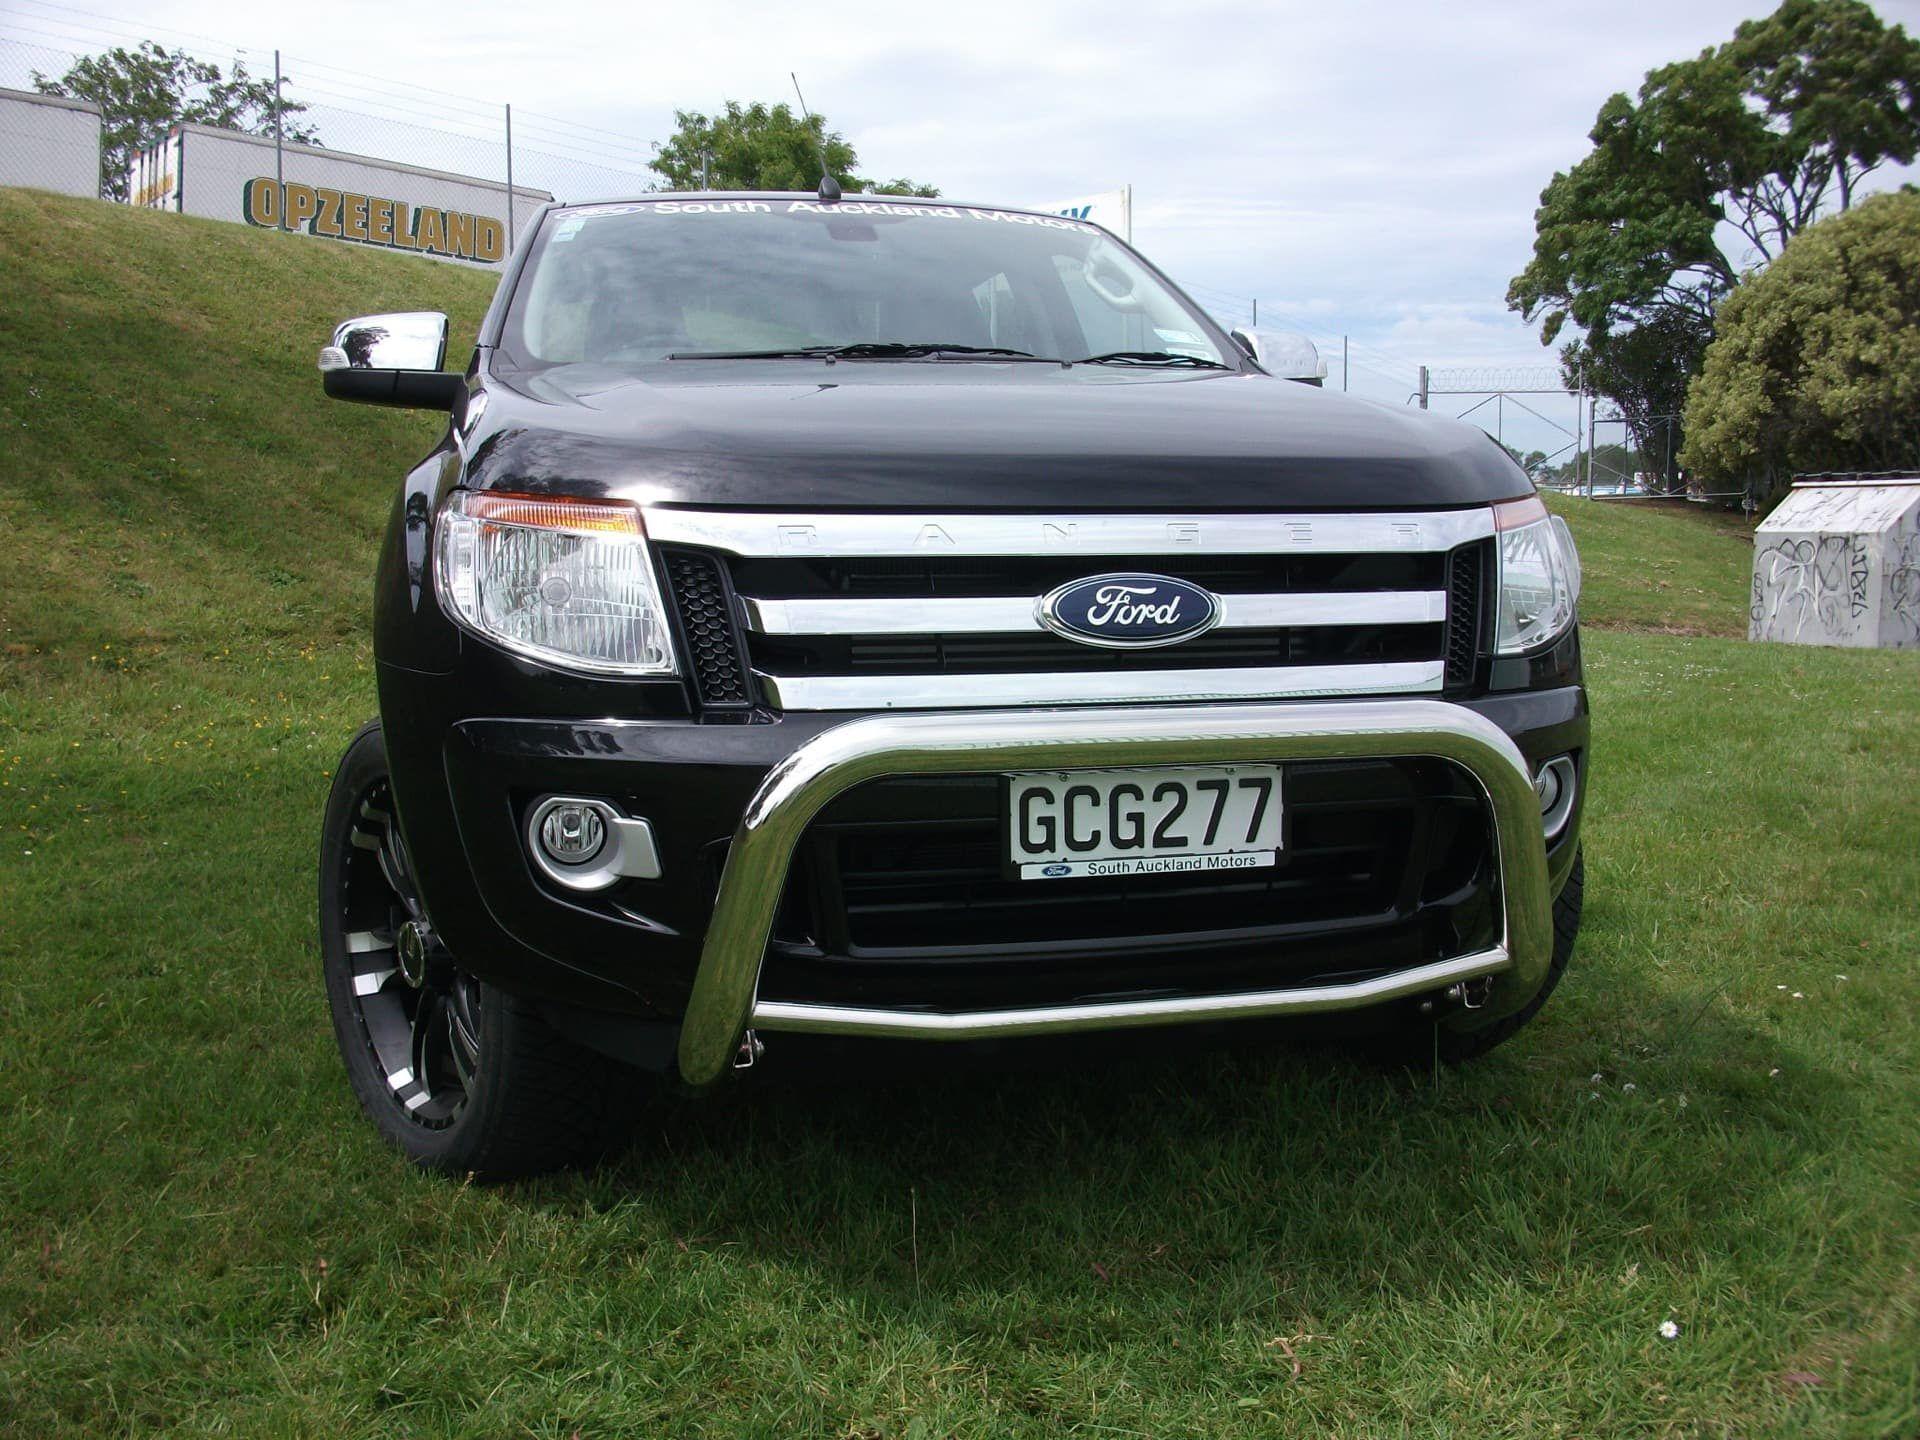 Ford ranger front nudge bar